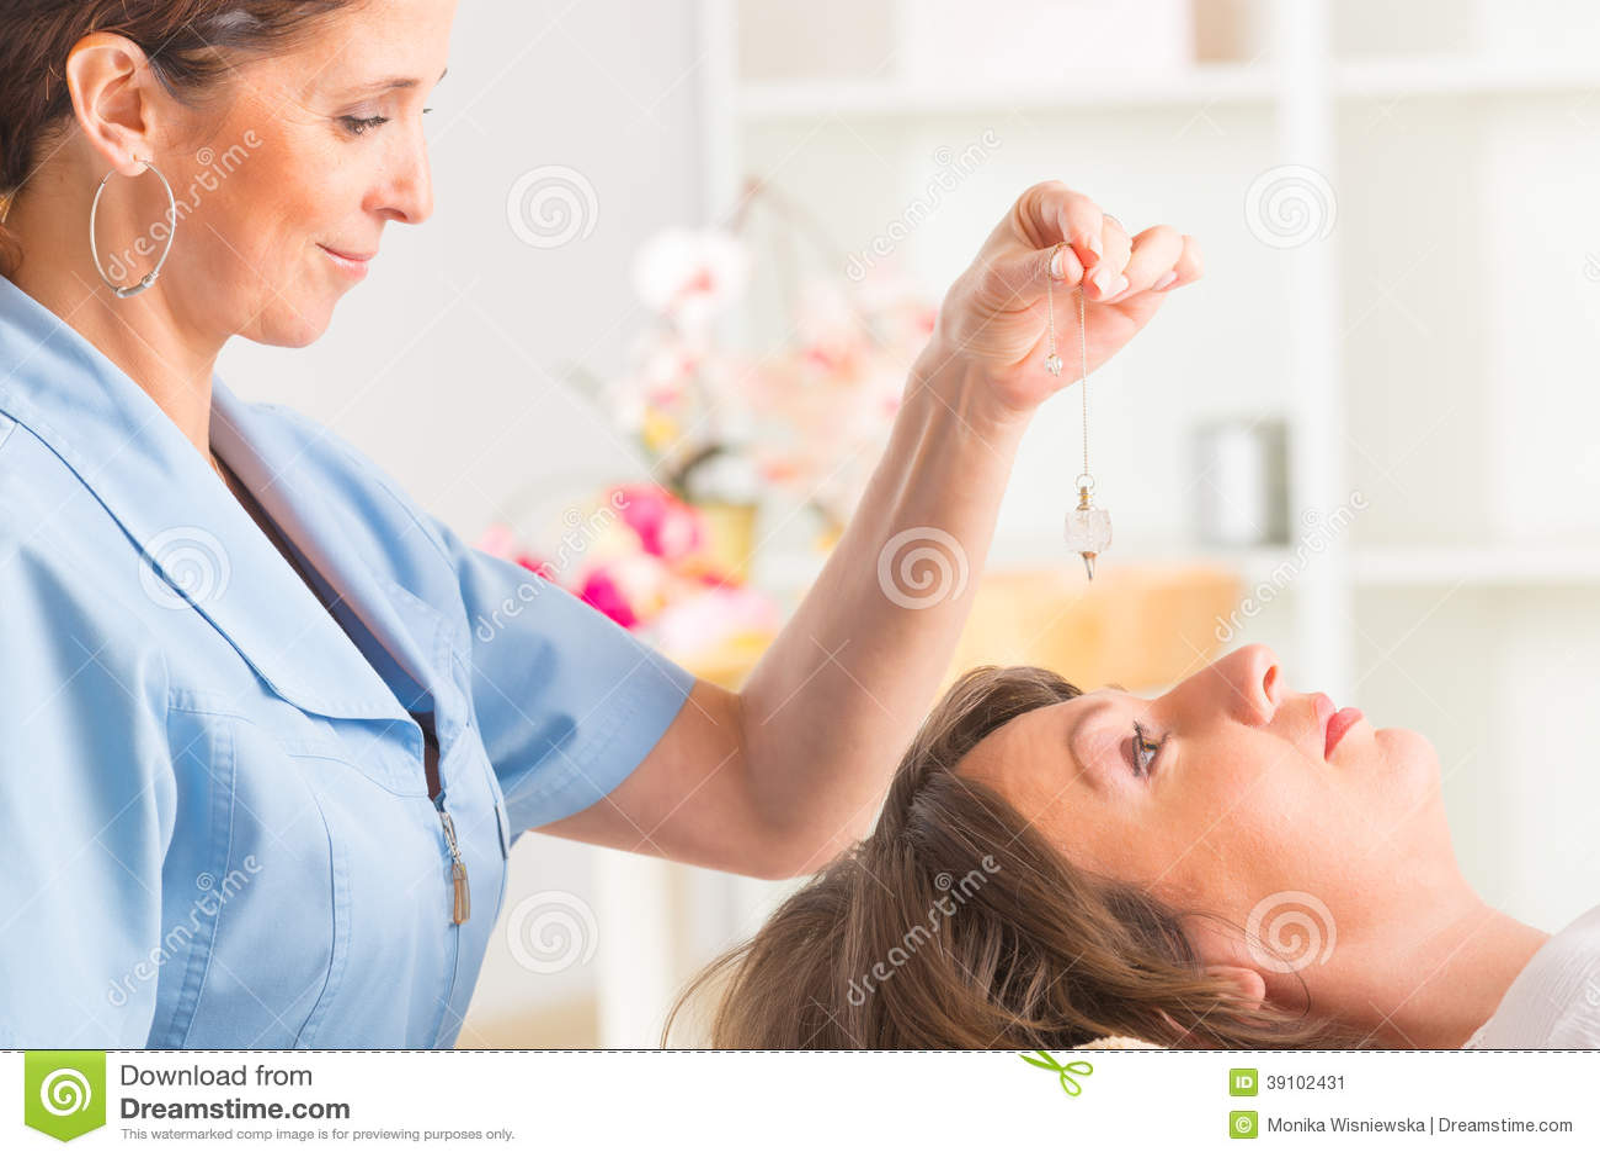 Therapist using pendulum